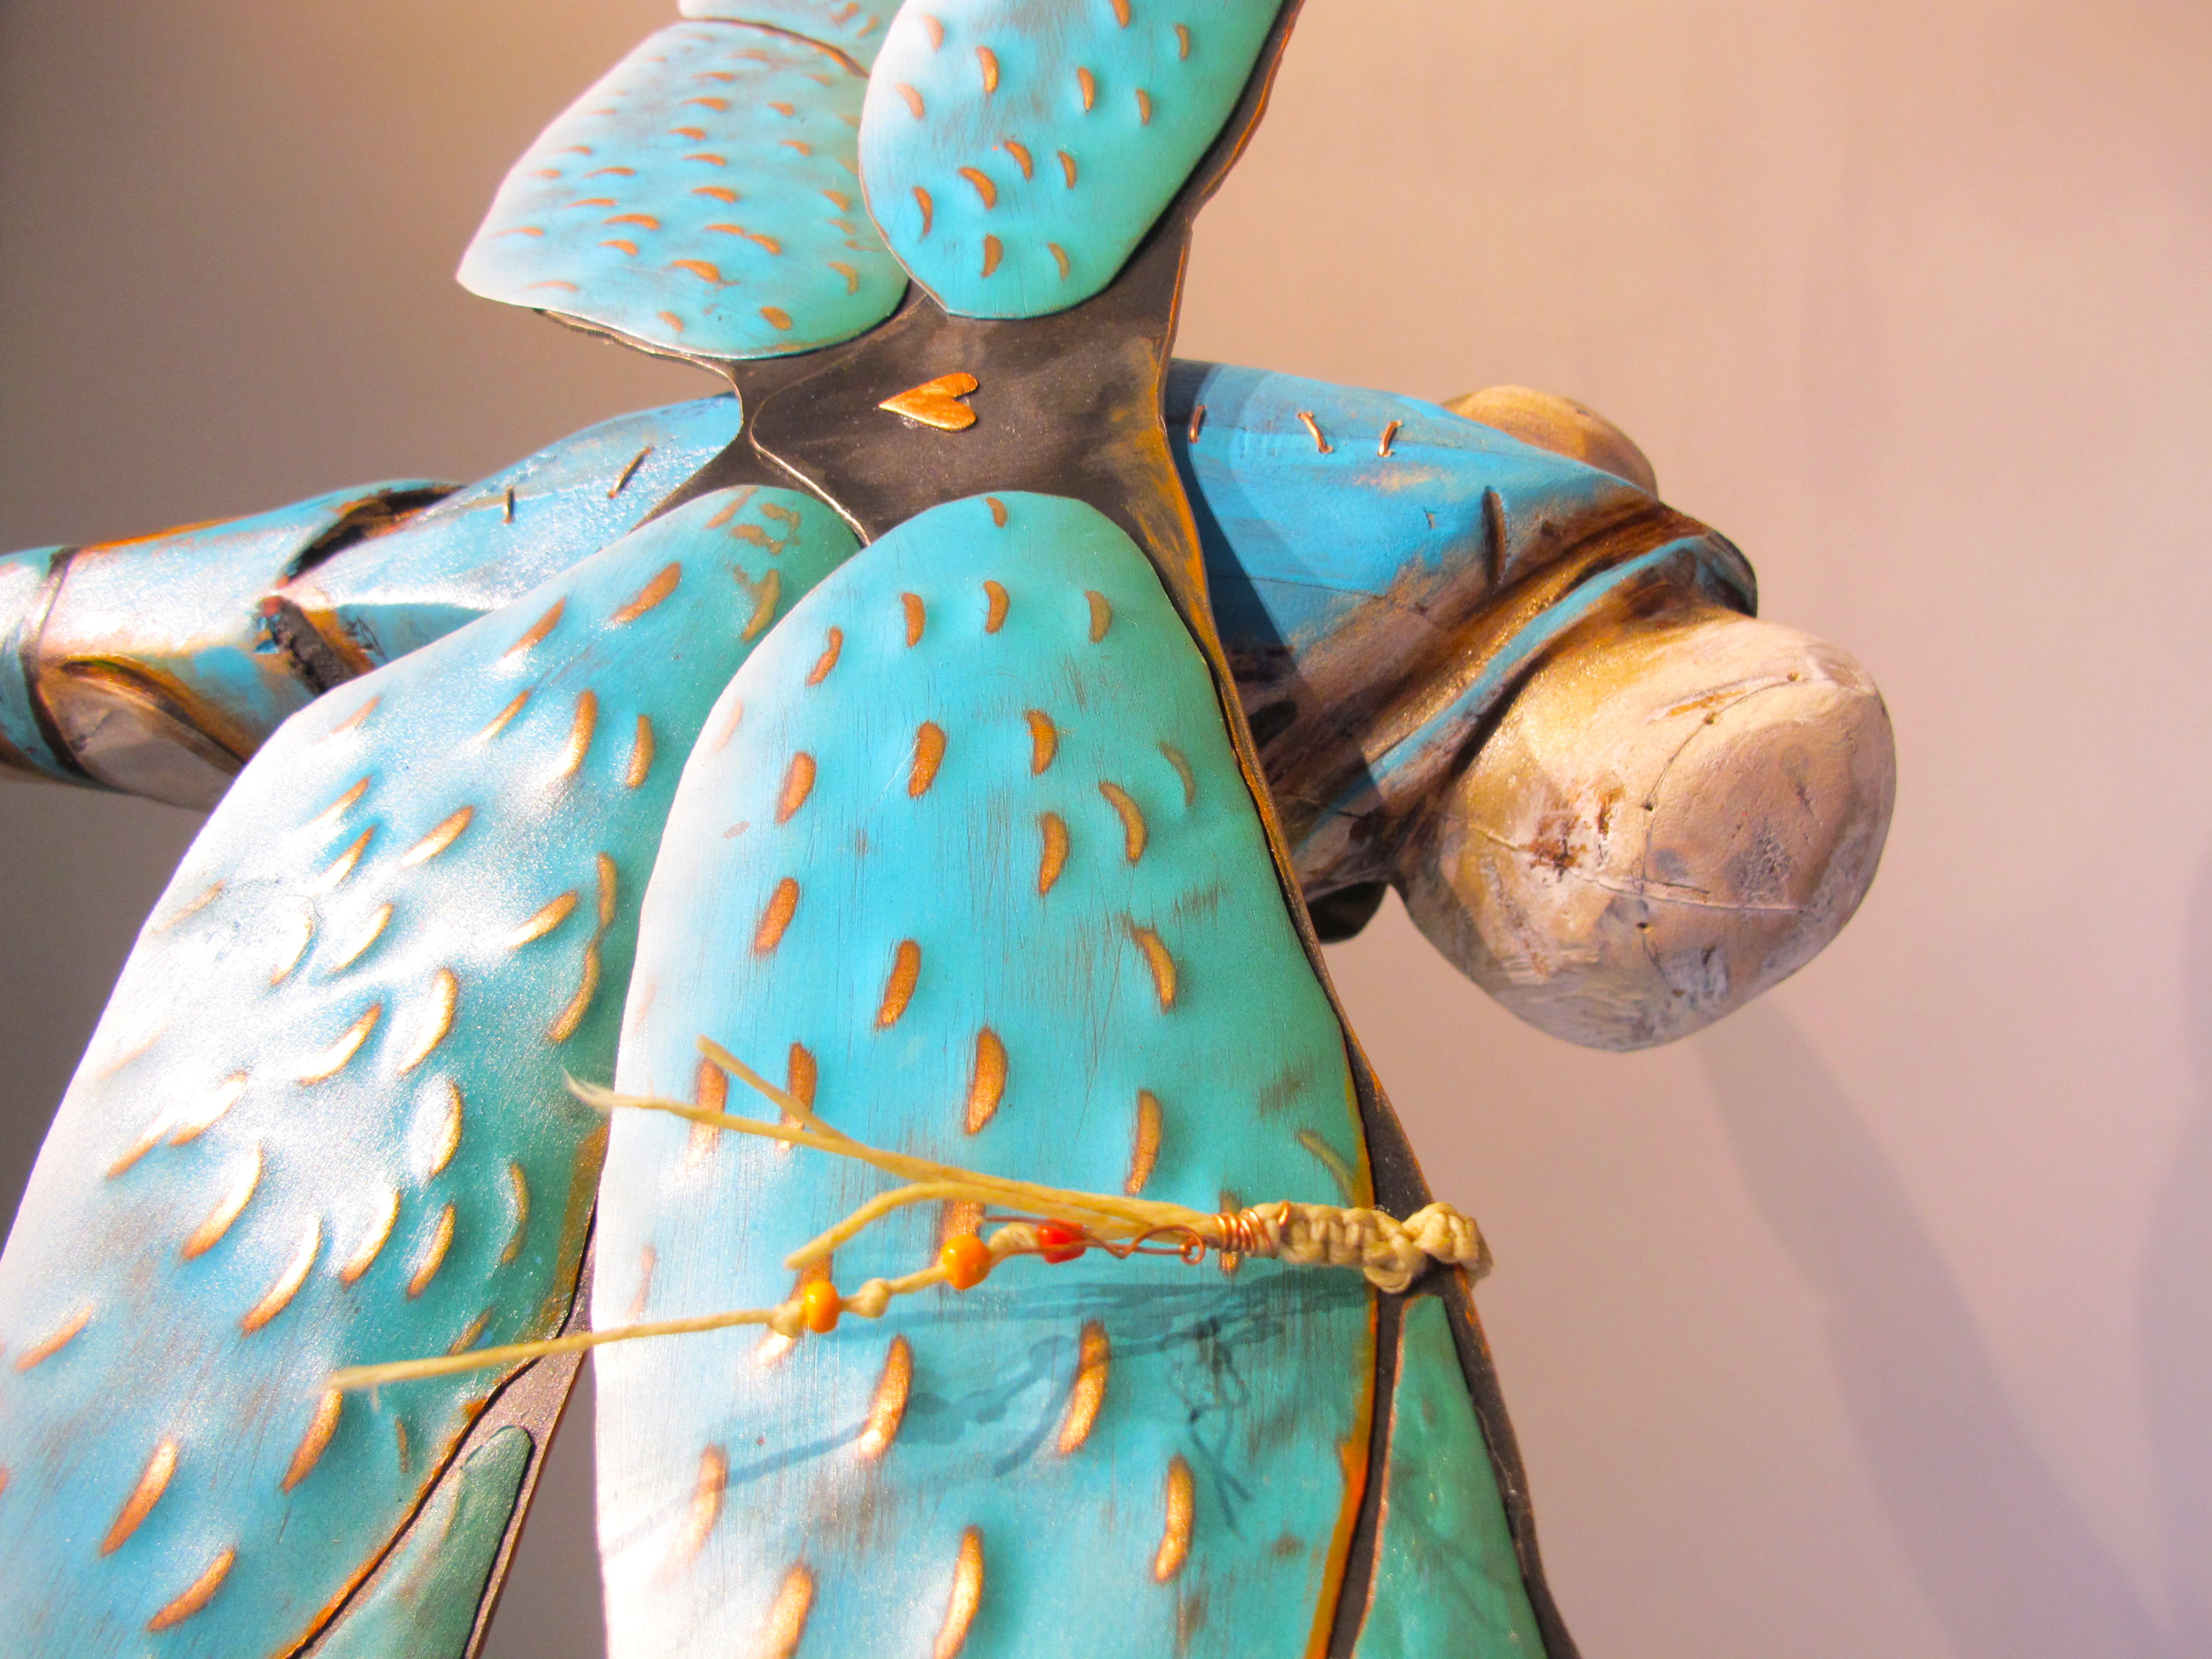 teal dragonfly-06.jpg